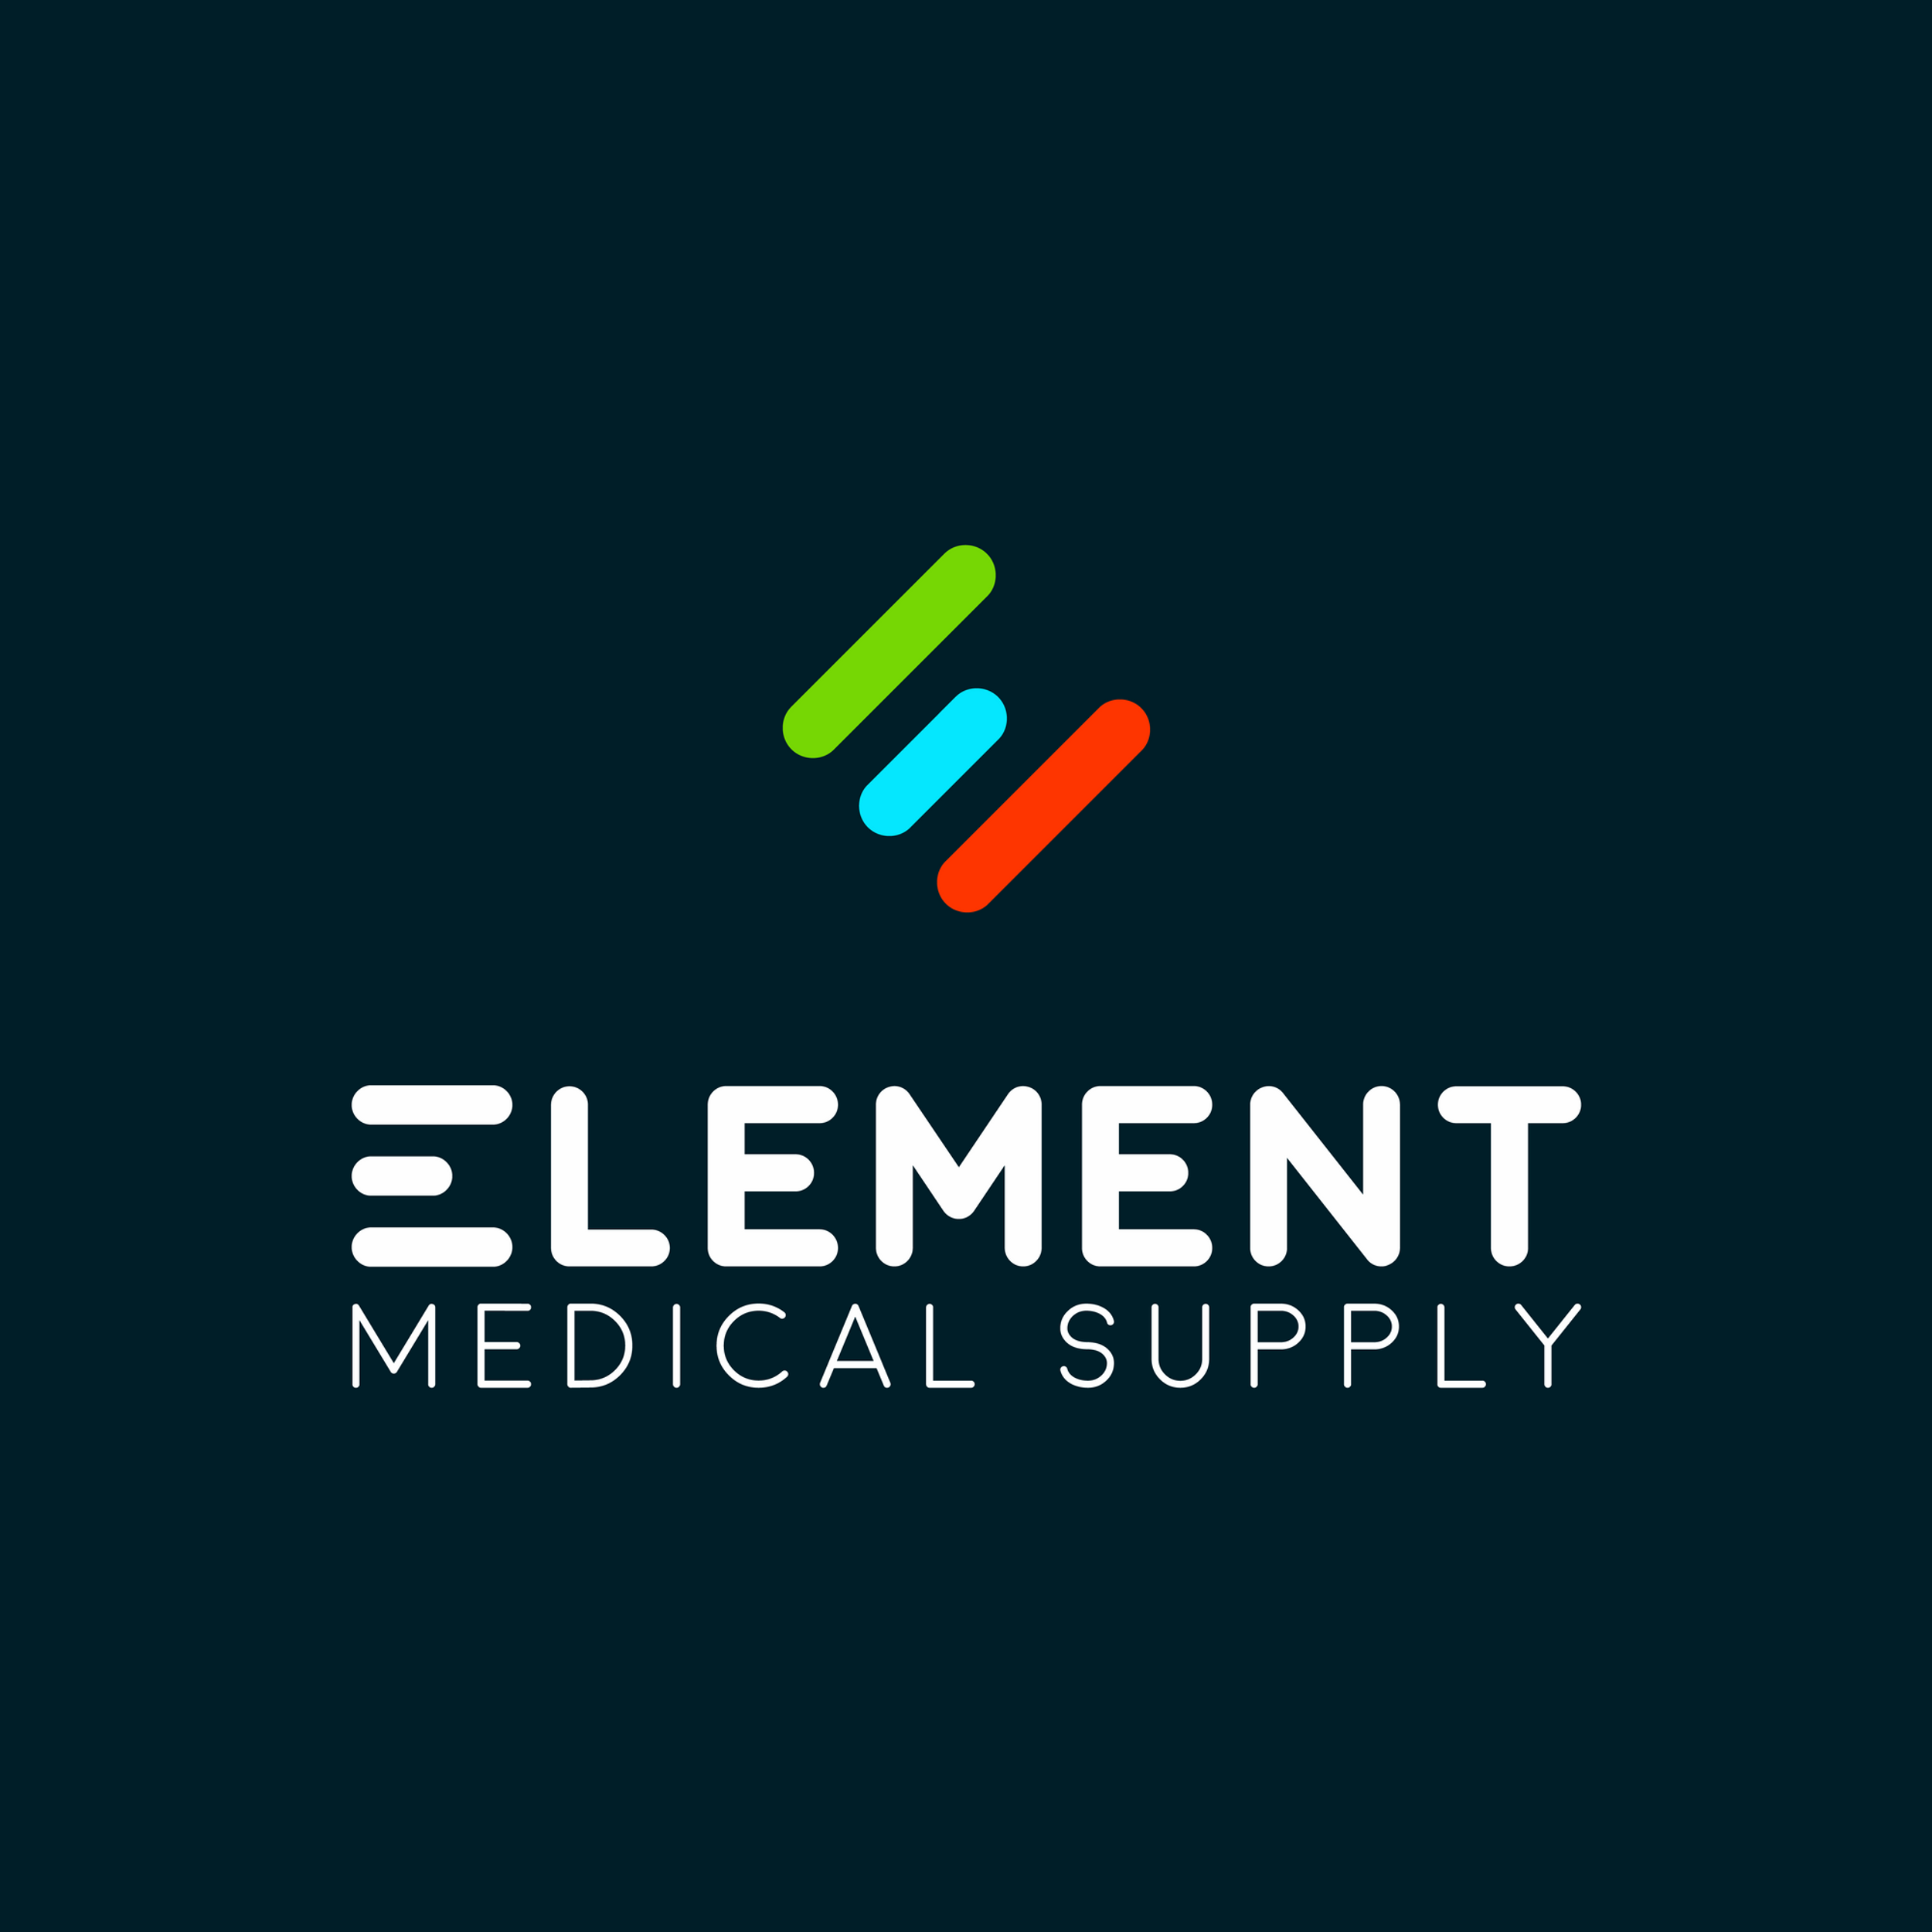 Element Medical Supply logo